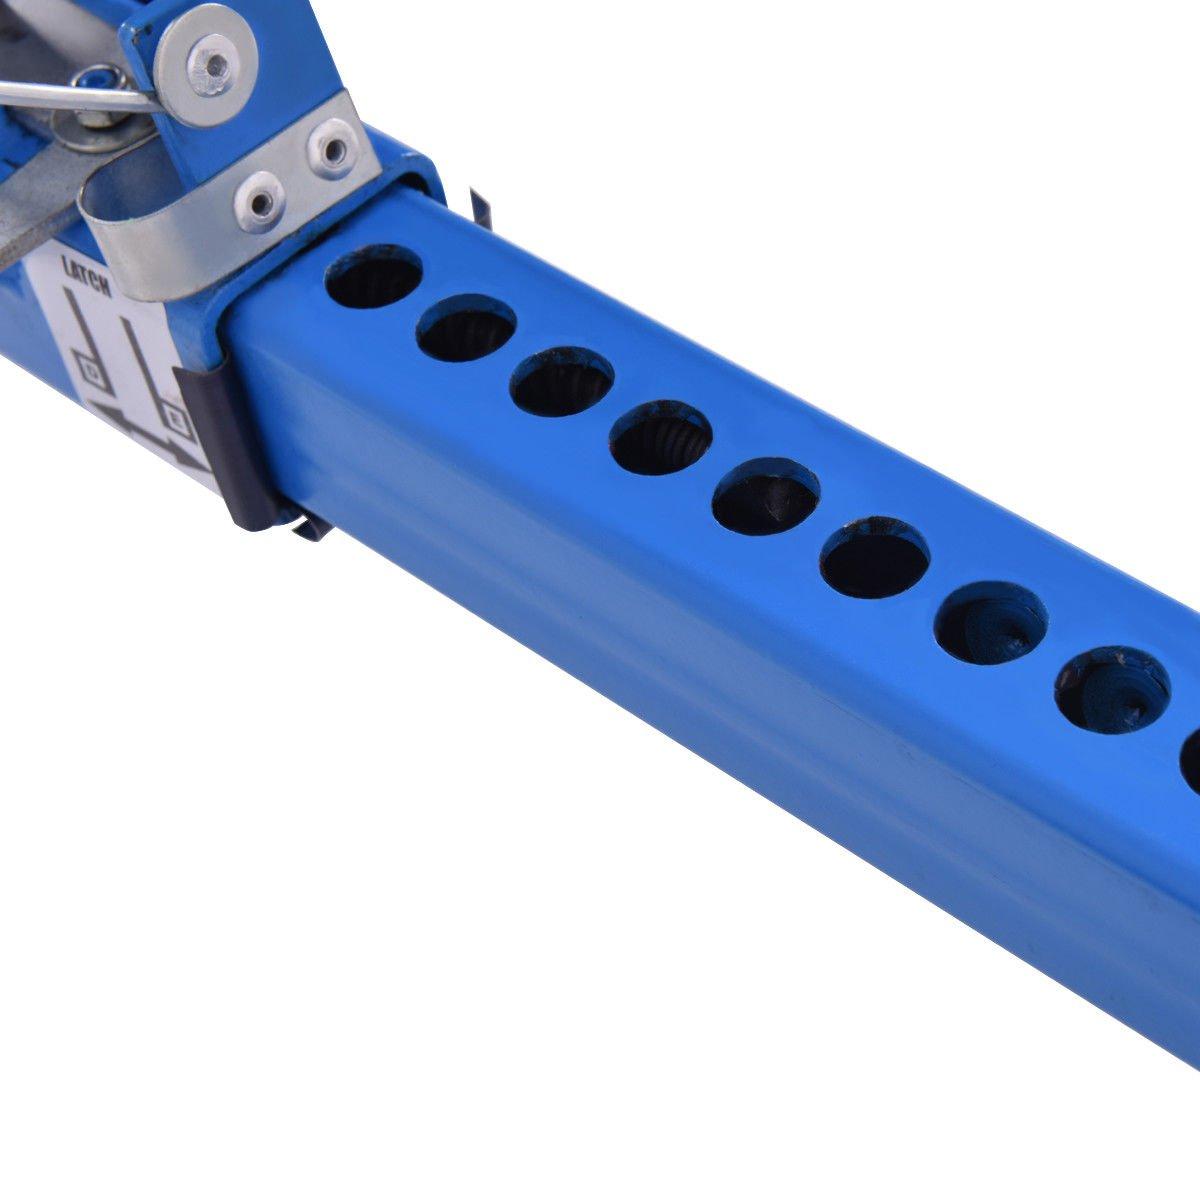 Goplus Wheel Dolly Car Skates Vehicle Positioning Hydraulic Tire Jack, 1250 lb (Blue) by Goplus (Image #8)